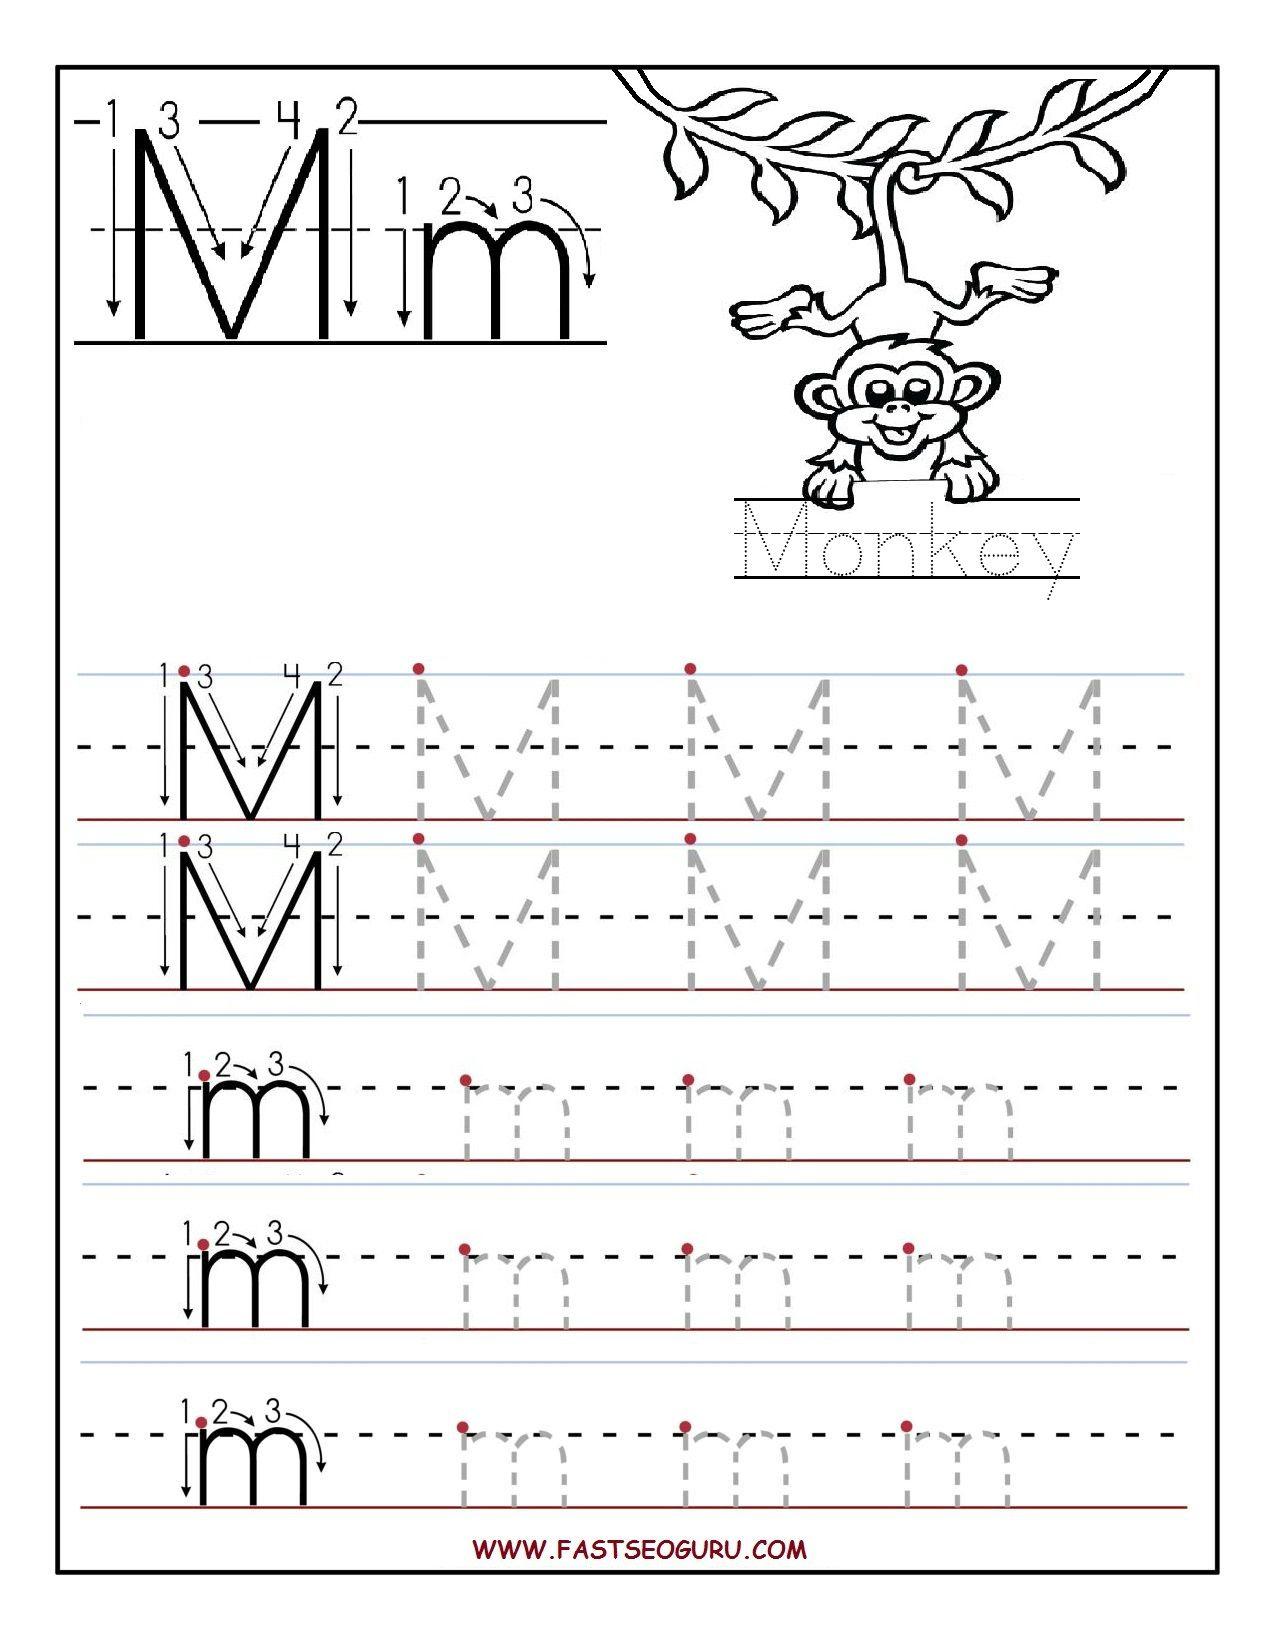 Printable Letter M Tracing Worksheets For Preschool